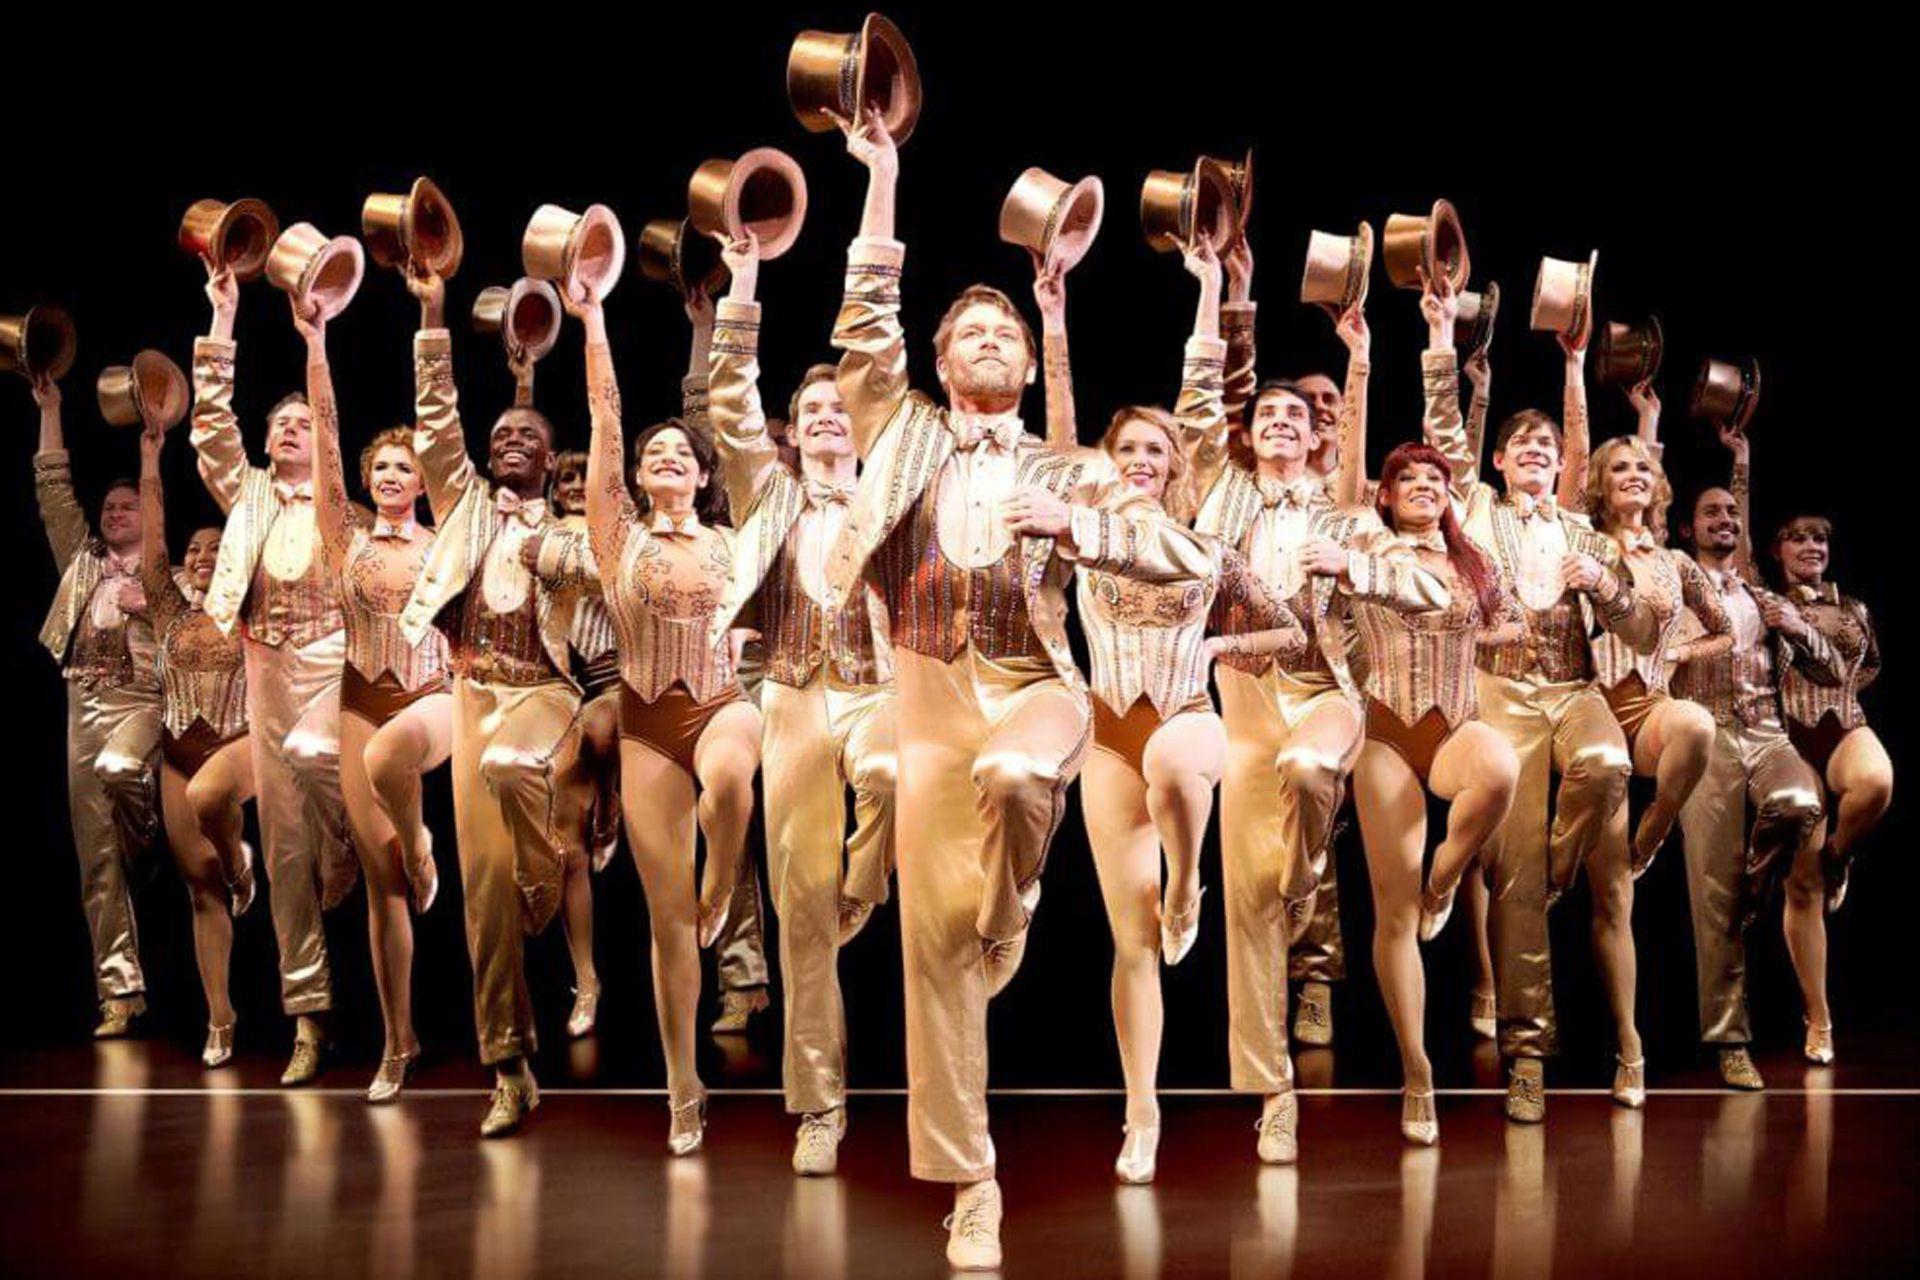 A Chorus Line, un clásico de la historia del musical